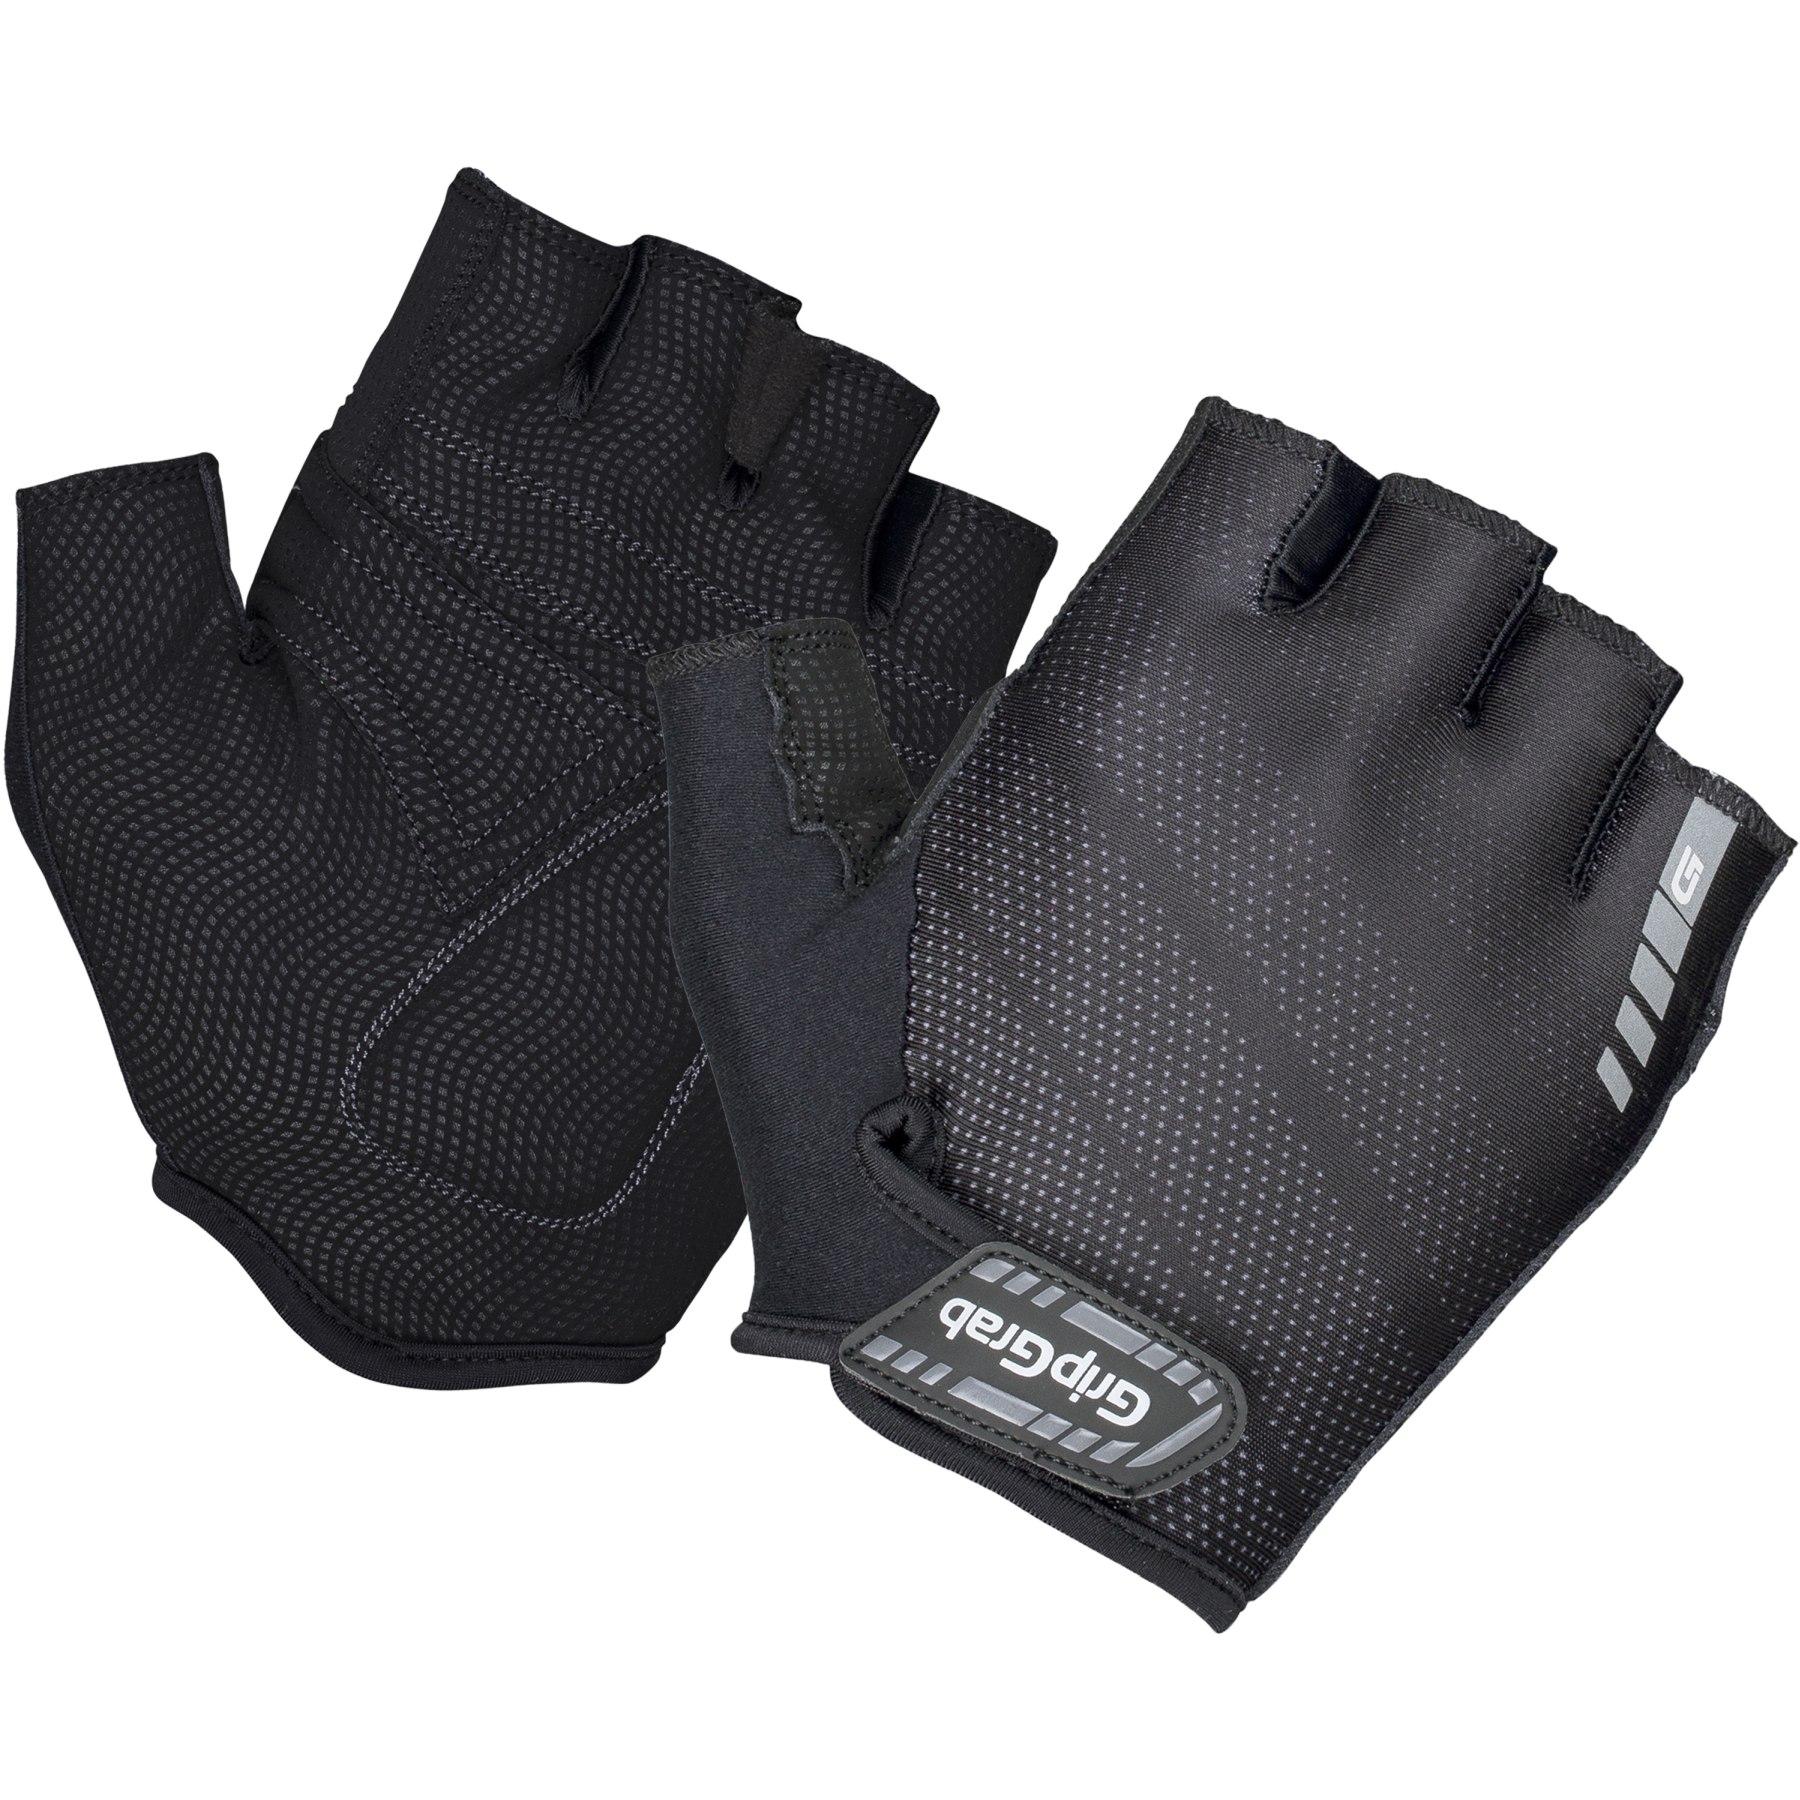 GripGrab Rouleur Padded Short Finger Glove - black